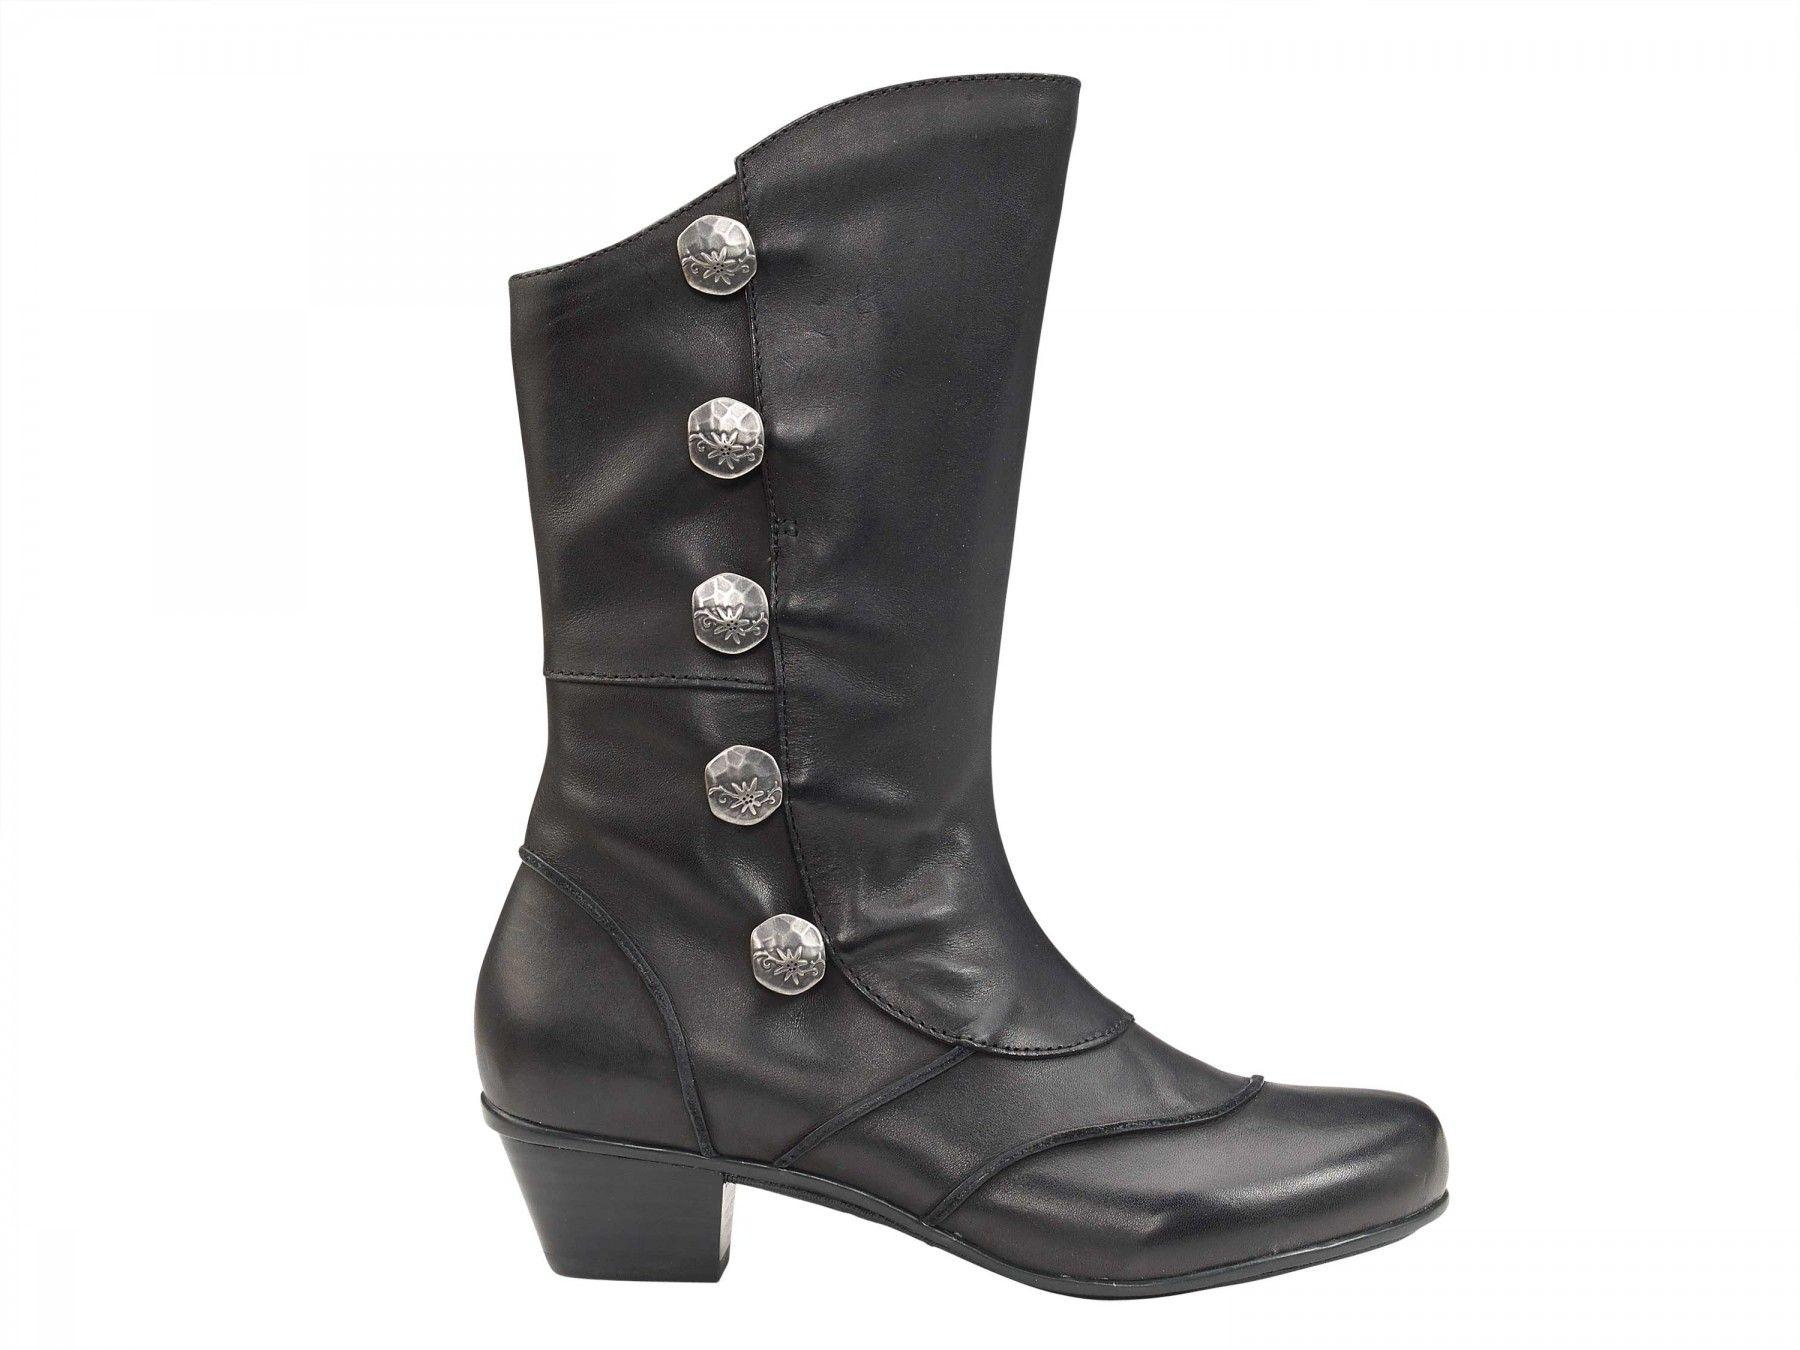 395510d09 Naomi Mid-Calf Boot - Black, Womens Comfort Boot - Aetrex Worldwide ...